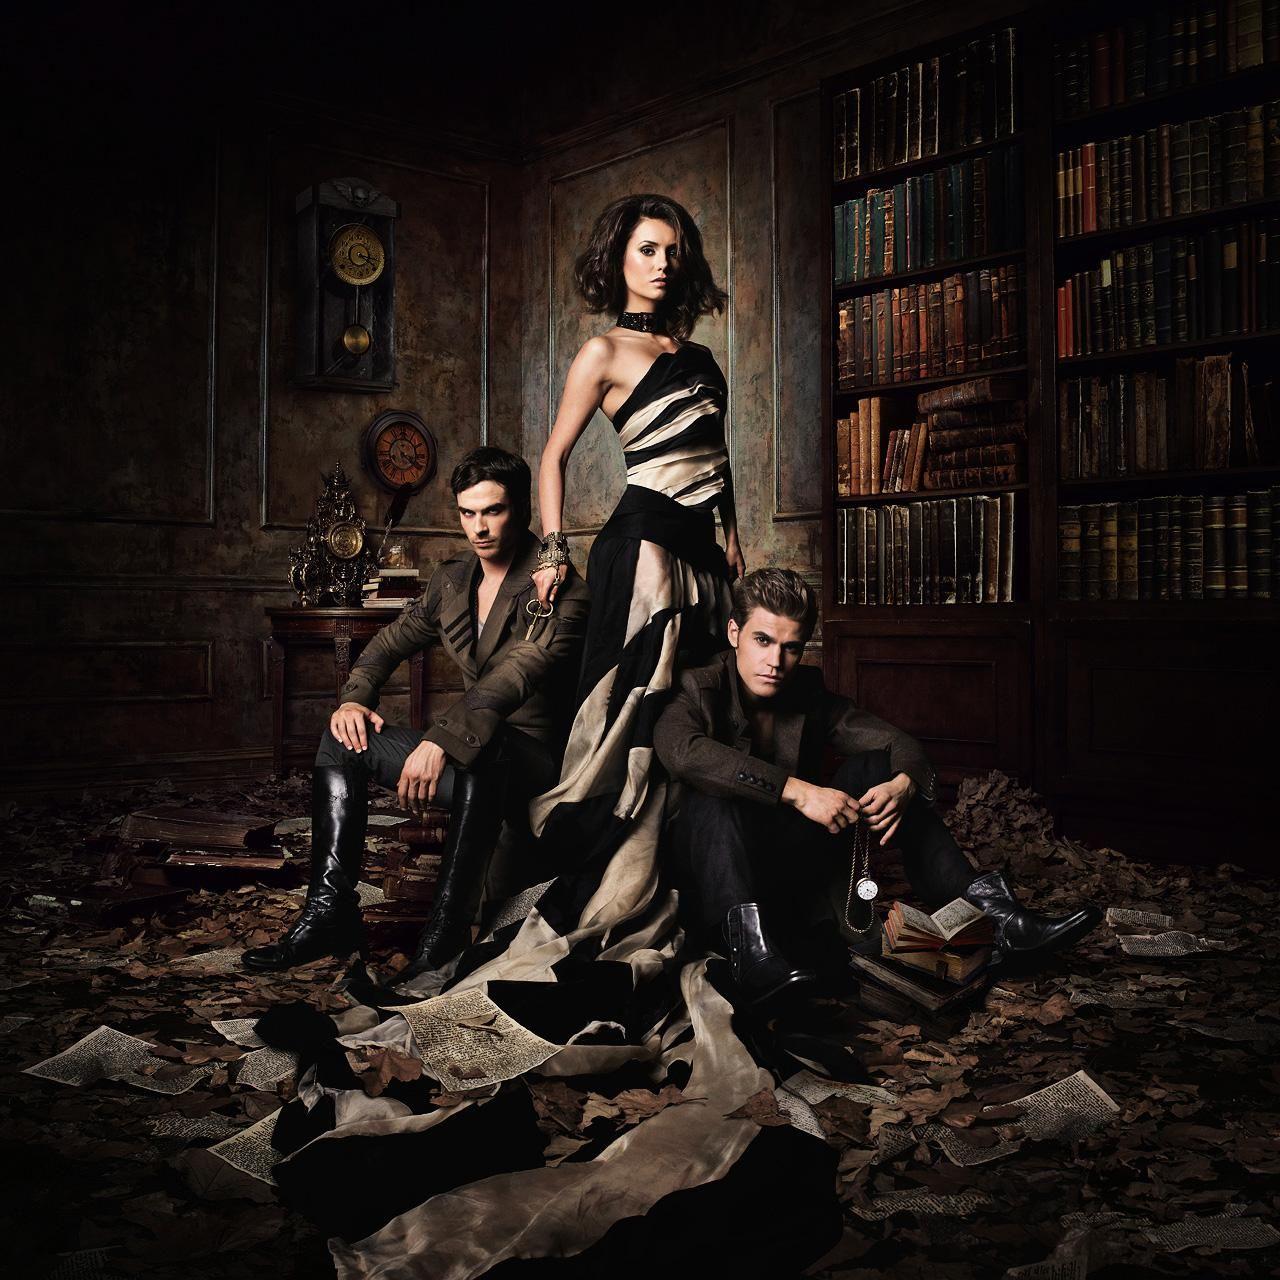 The Vampire Diaries Awesome Artwork Vampire Diaries Poster